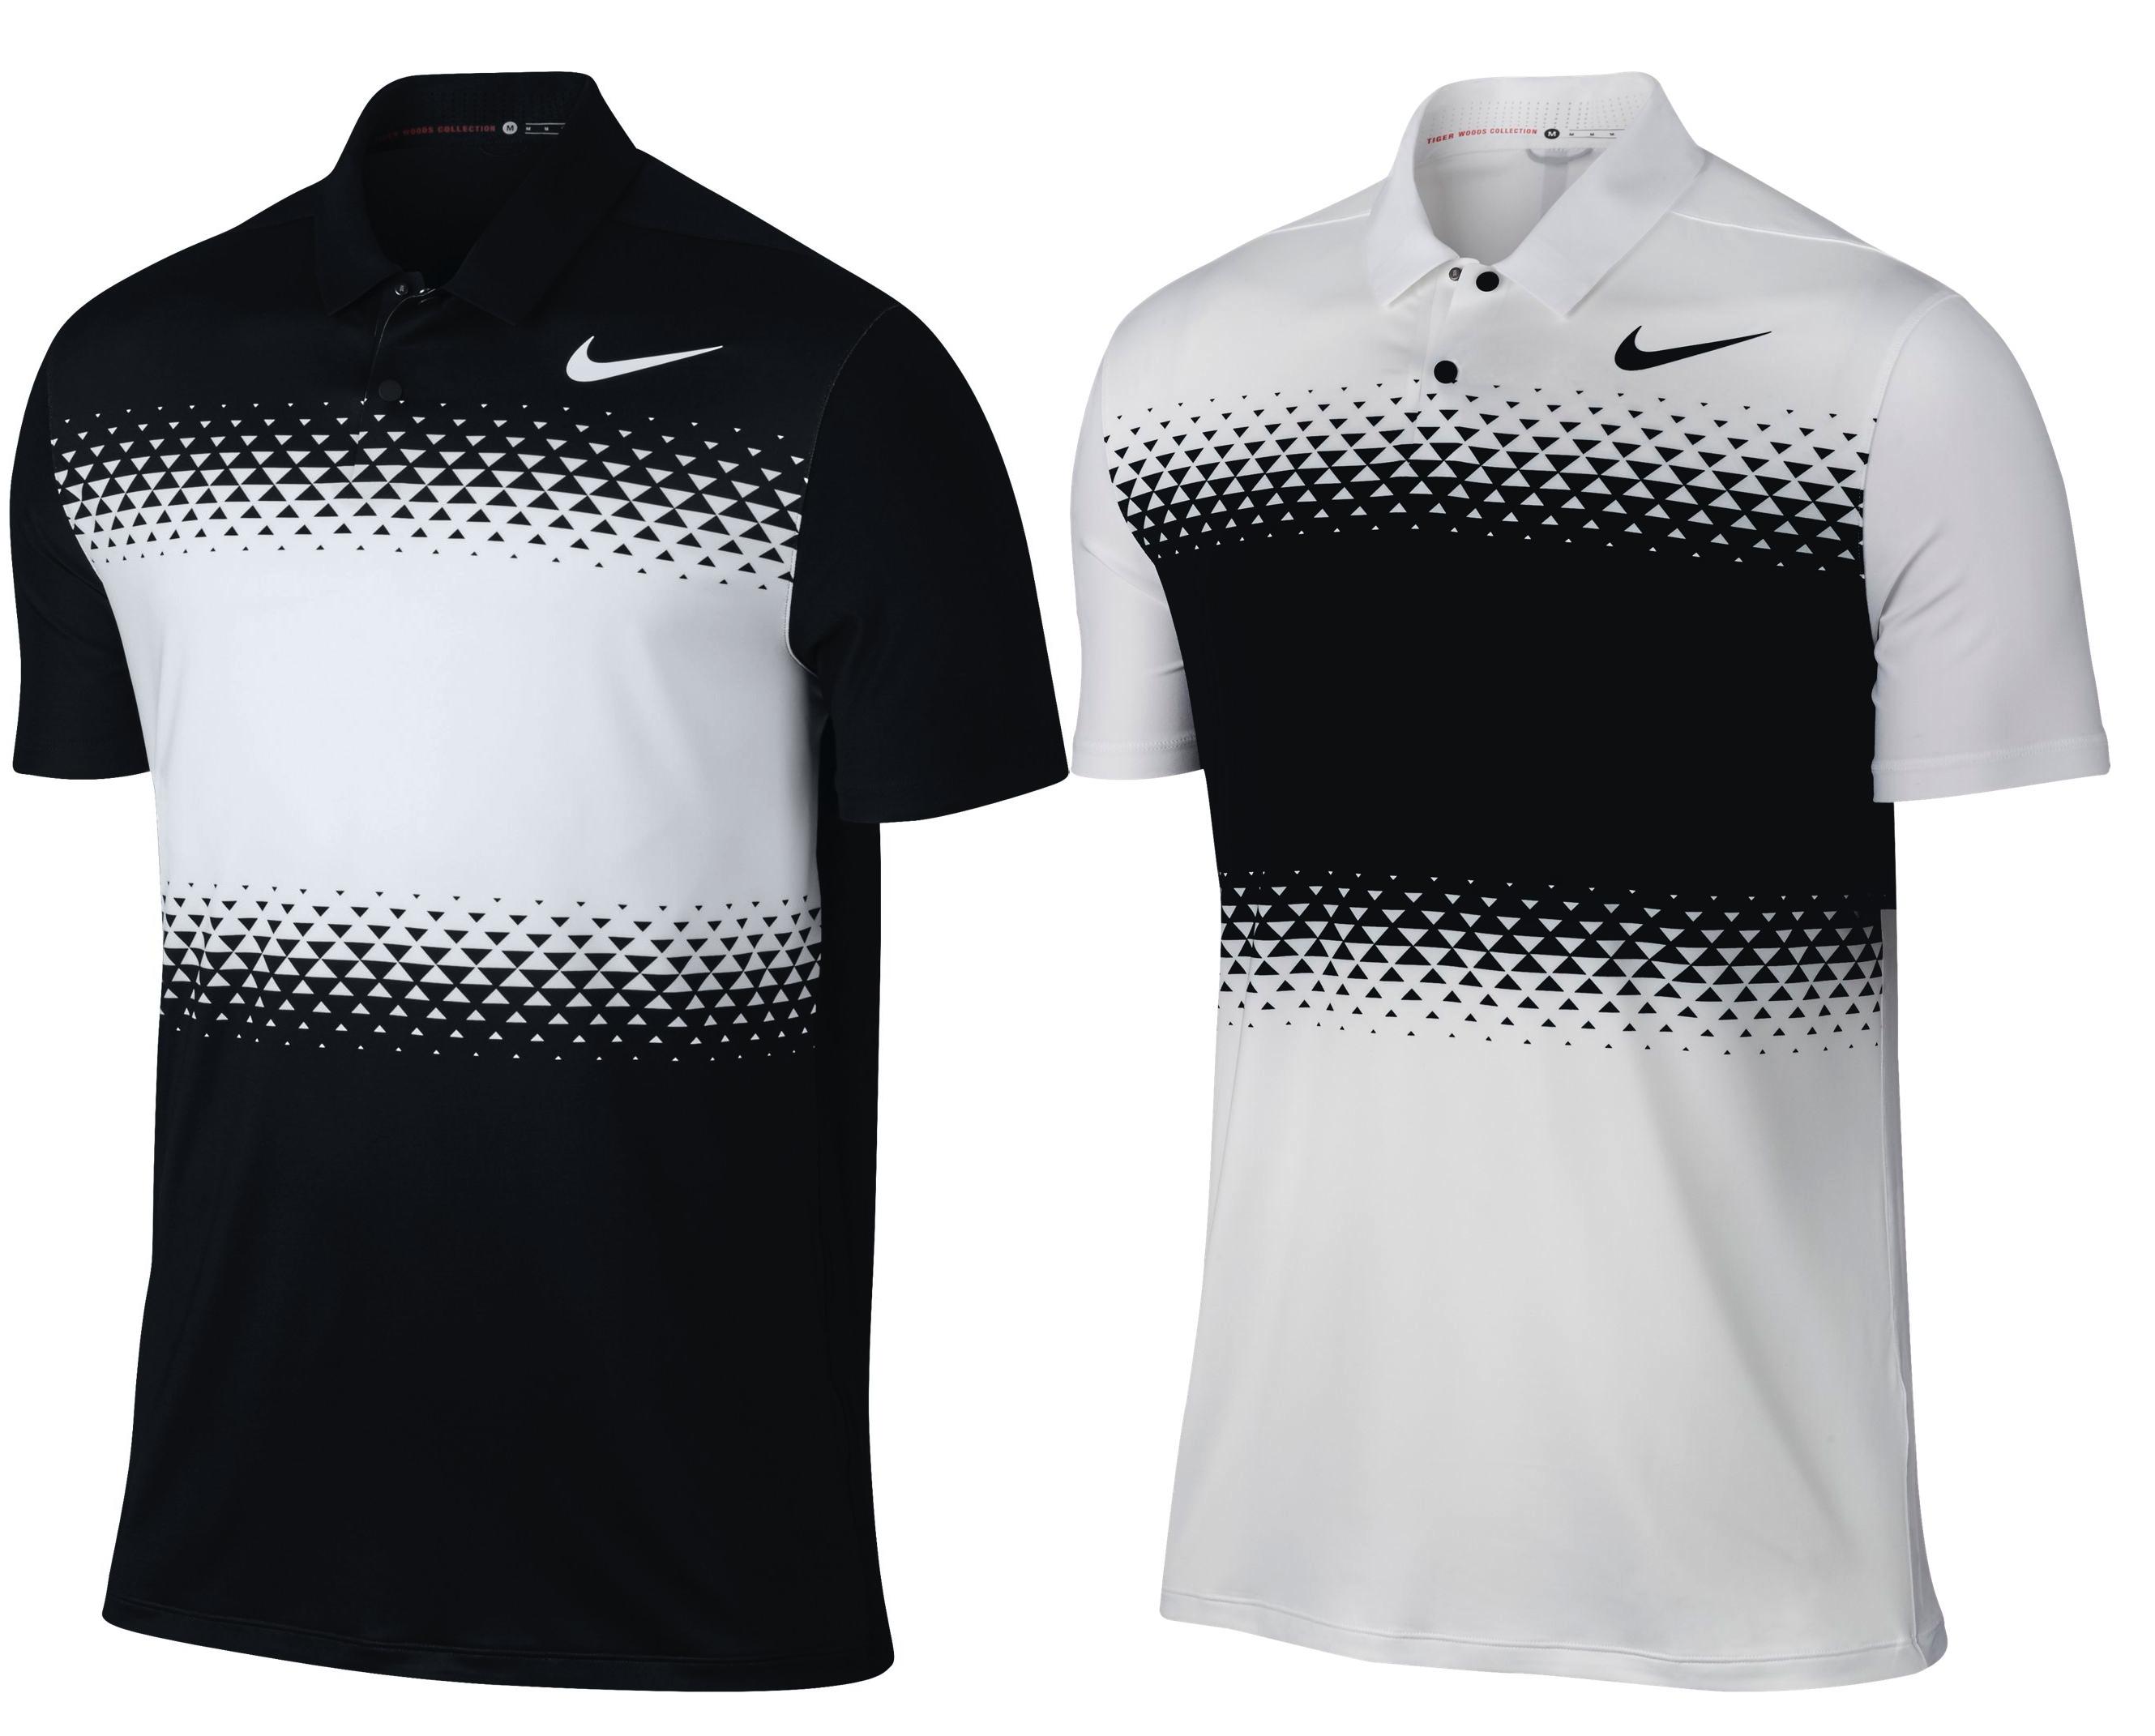 Nike golf shirts 2017